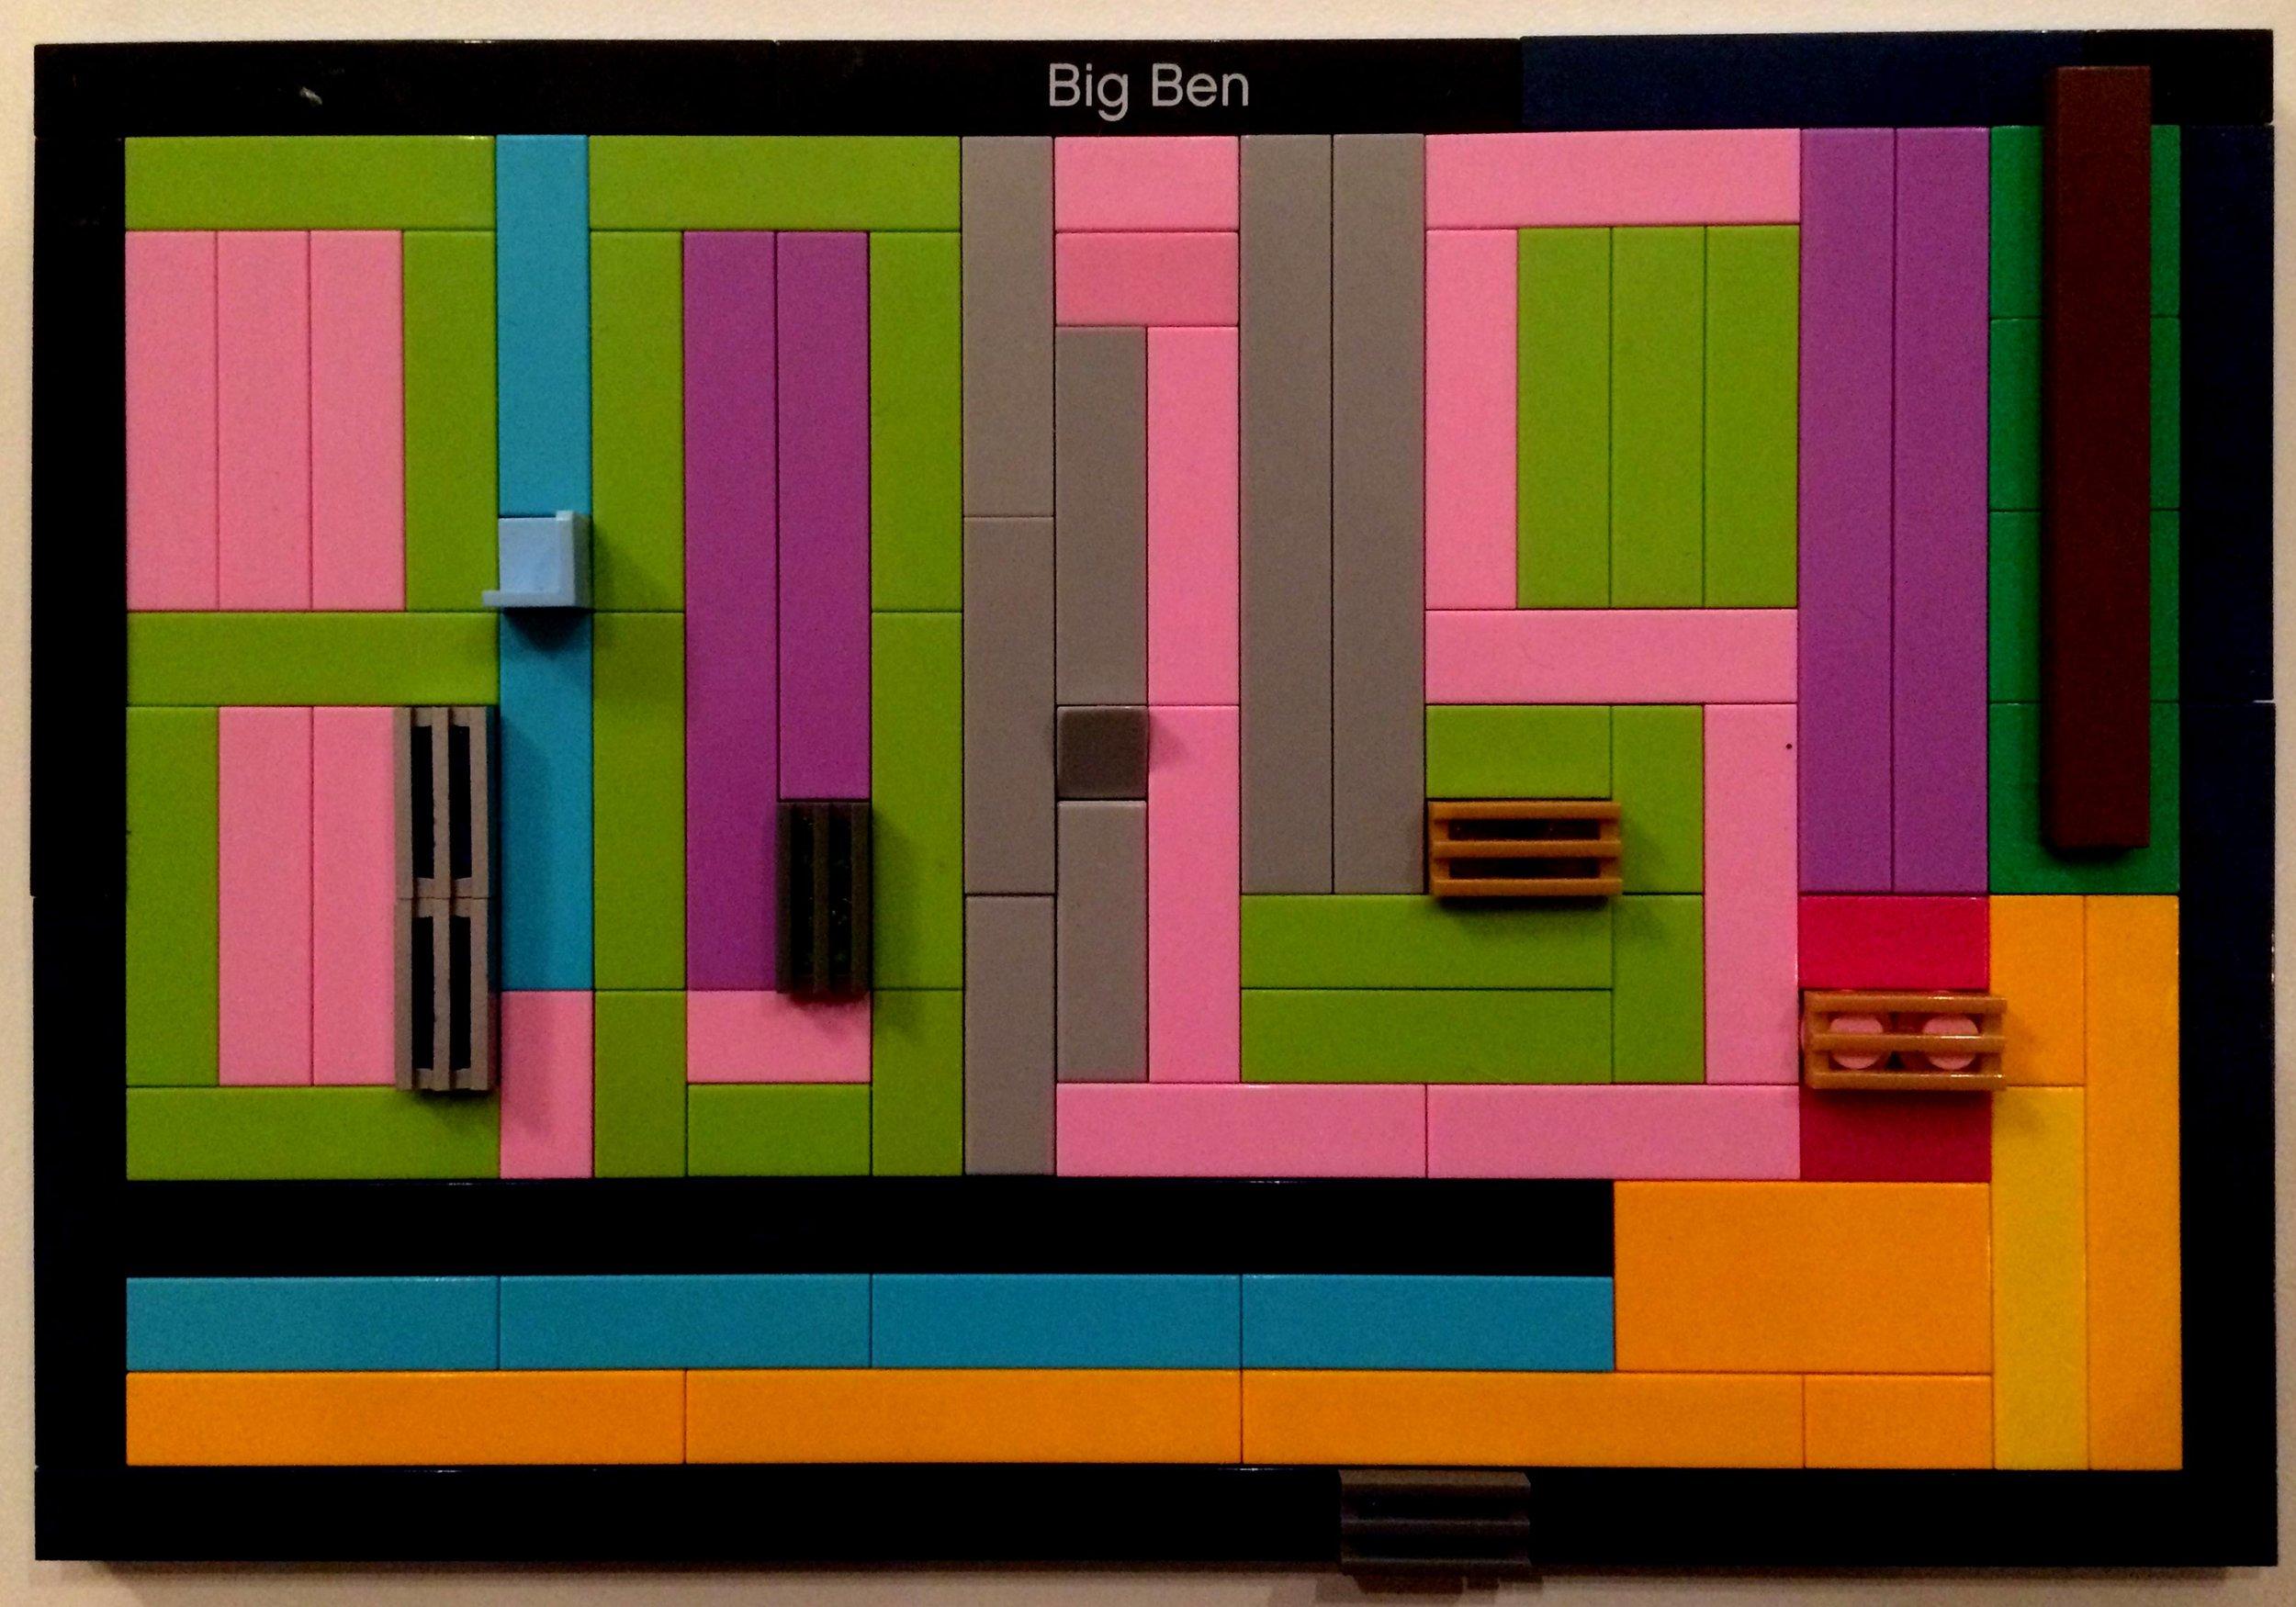 BIGBEN_LEGO_ART.jpg